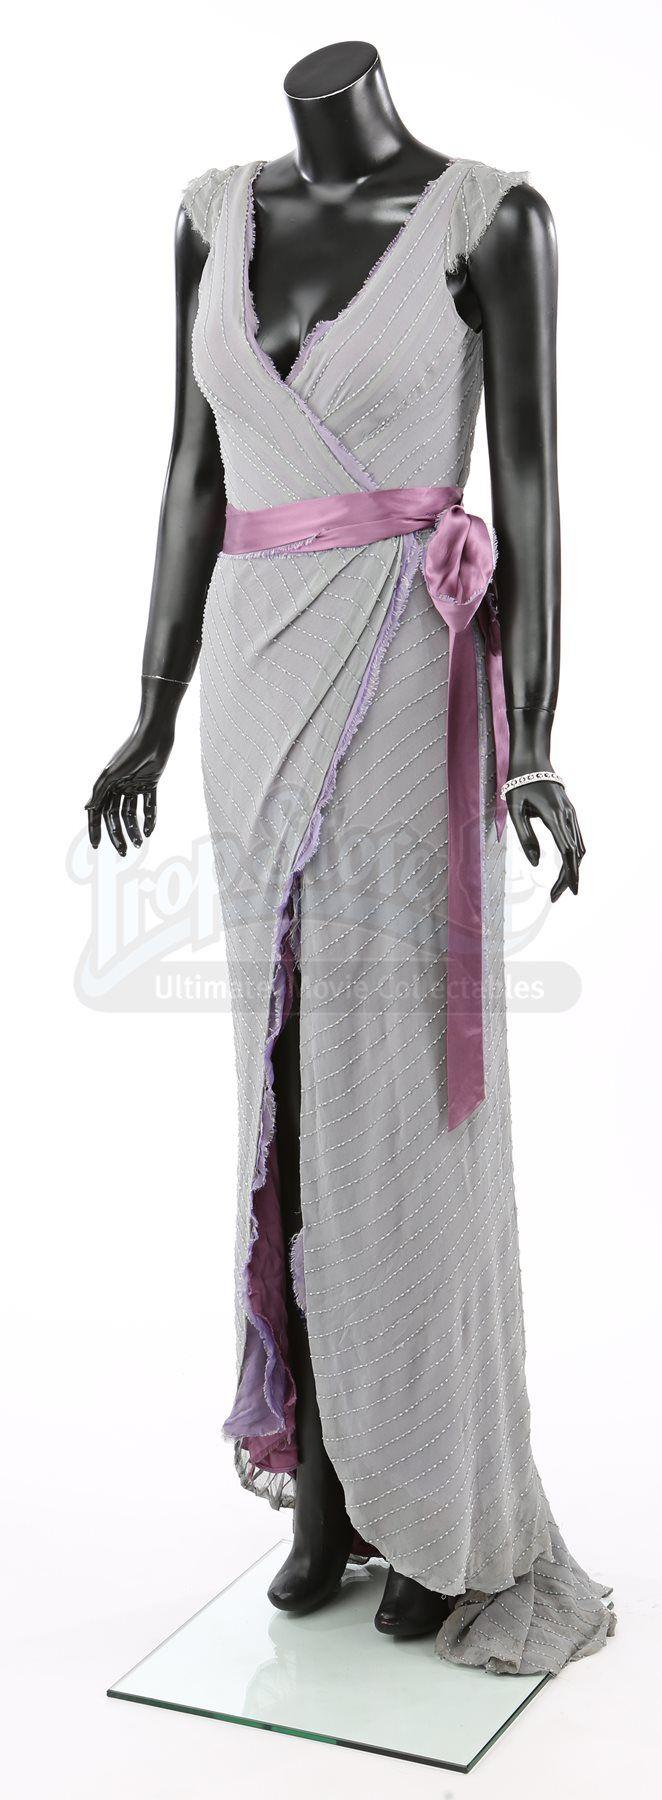 Rosalie Hale's Wedding Costume - Current price: $50